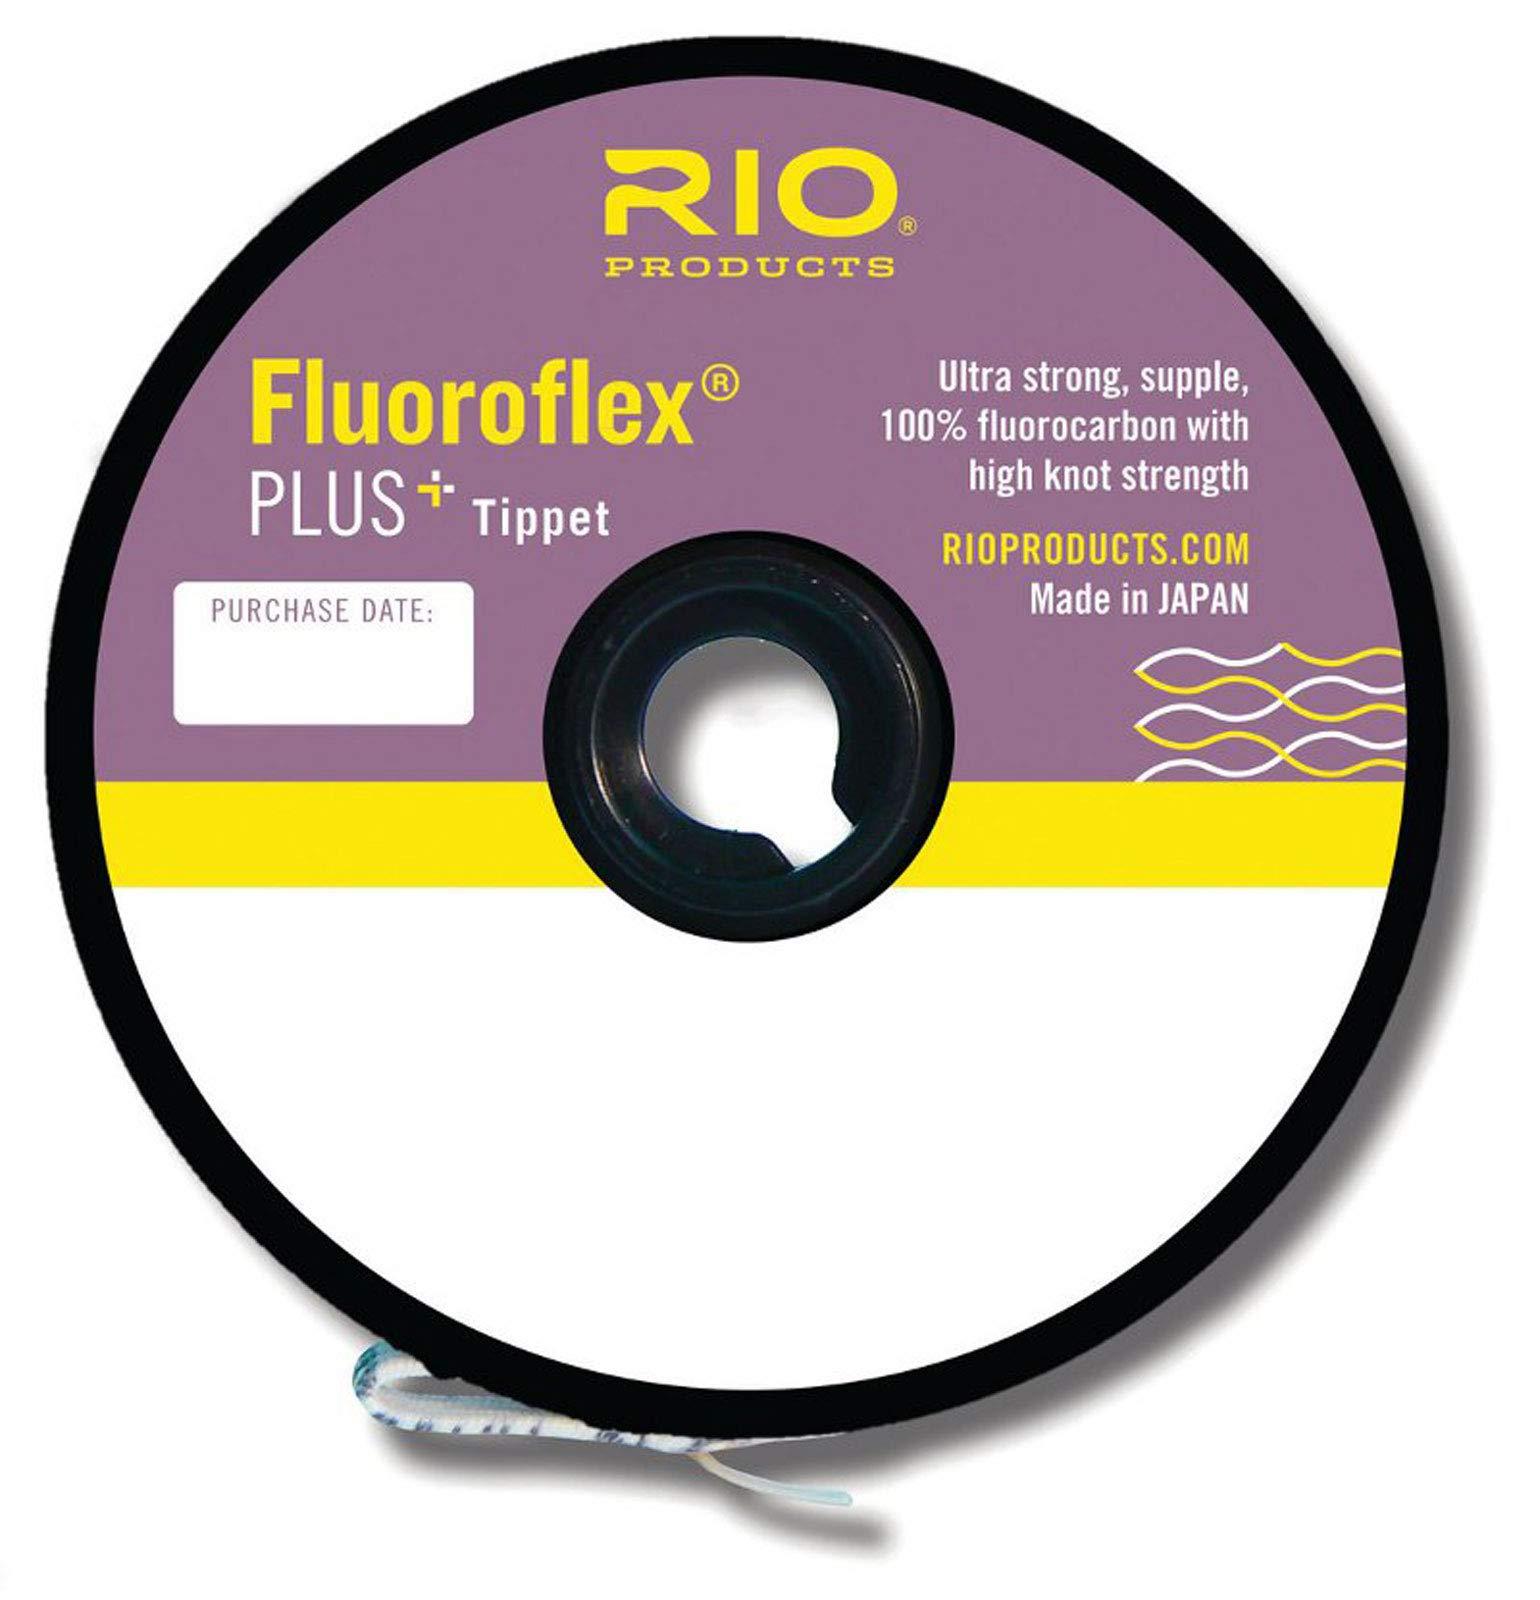 Rio Fluoroflex Plus Tippet  7x - 2.5lb - 30yd